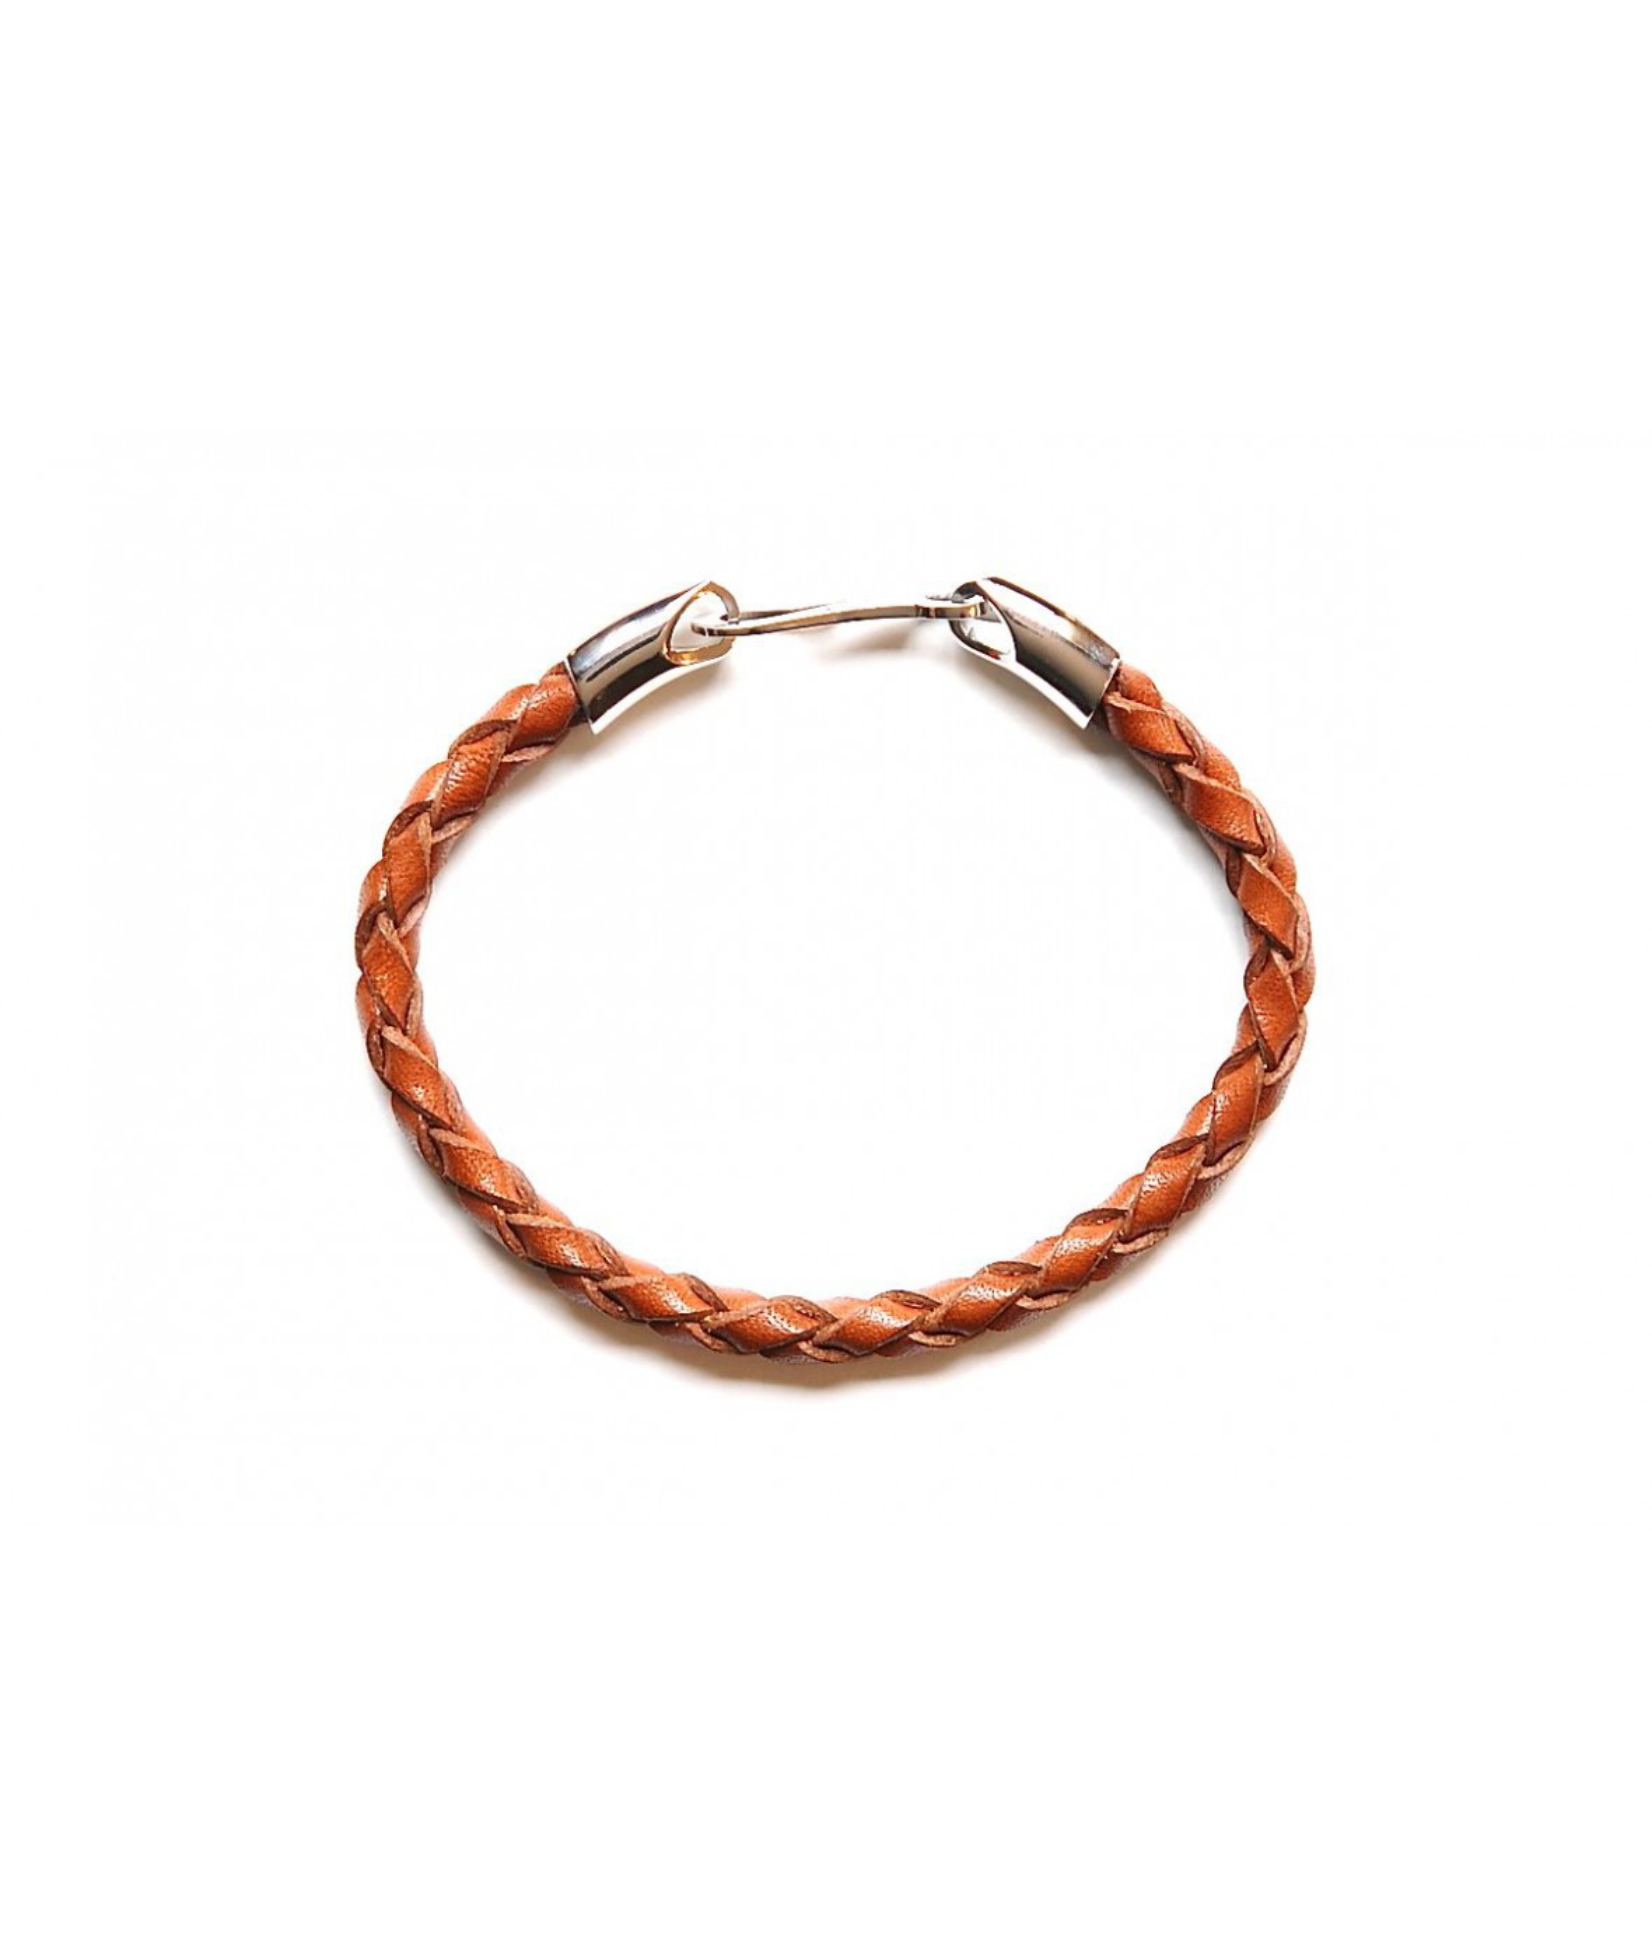 Santoni Bracelet Light Brown